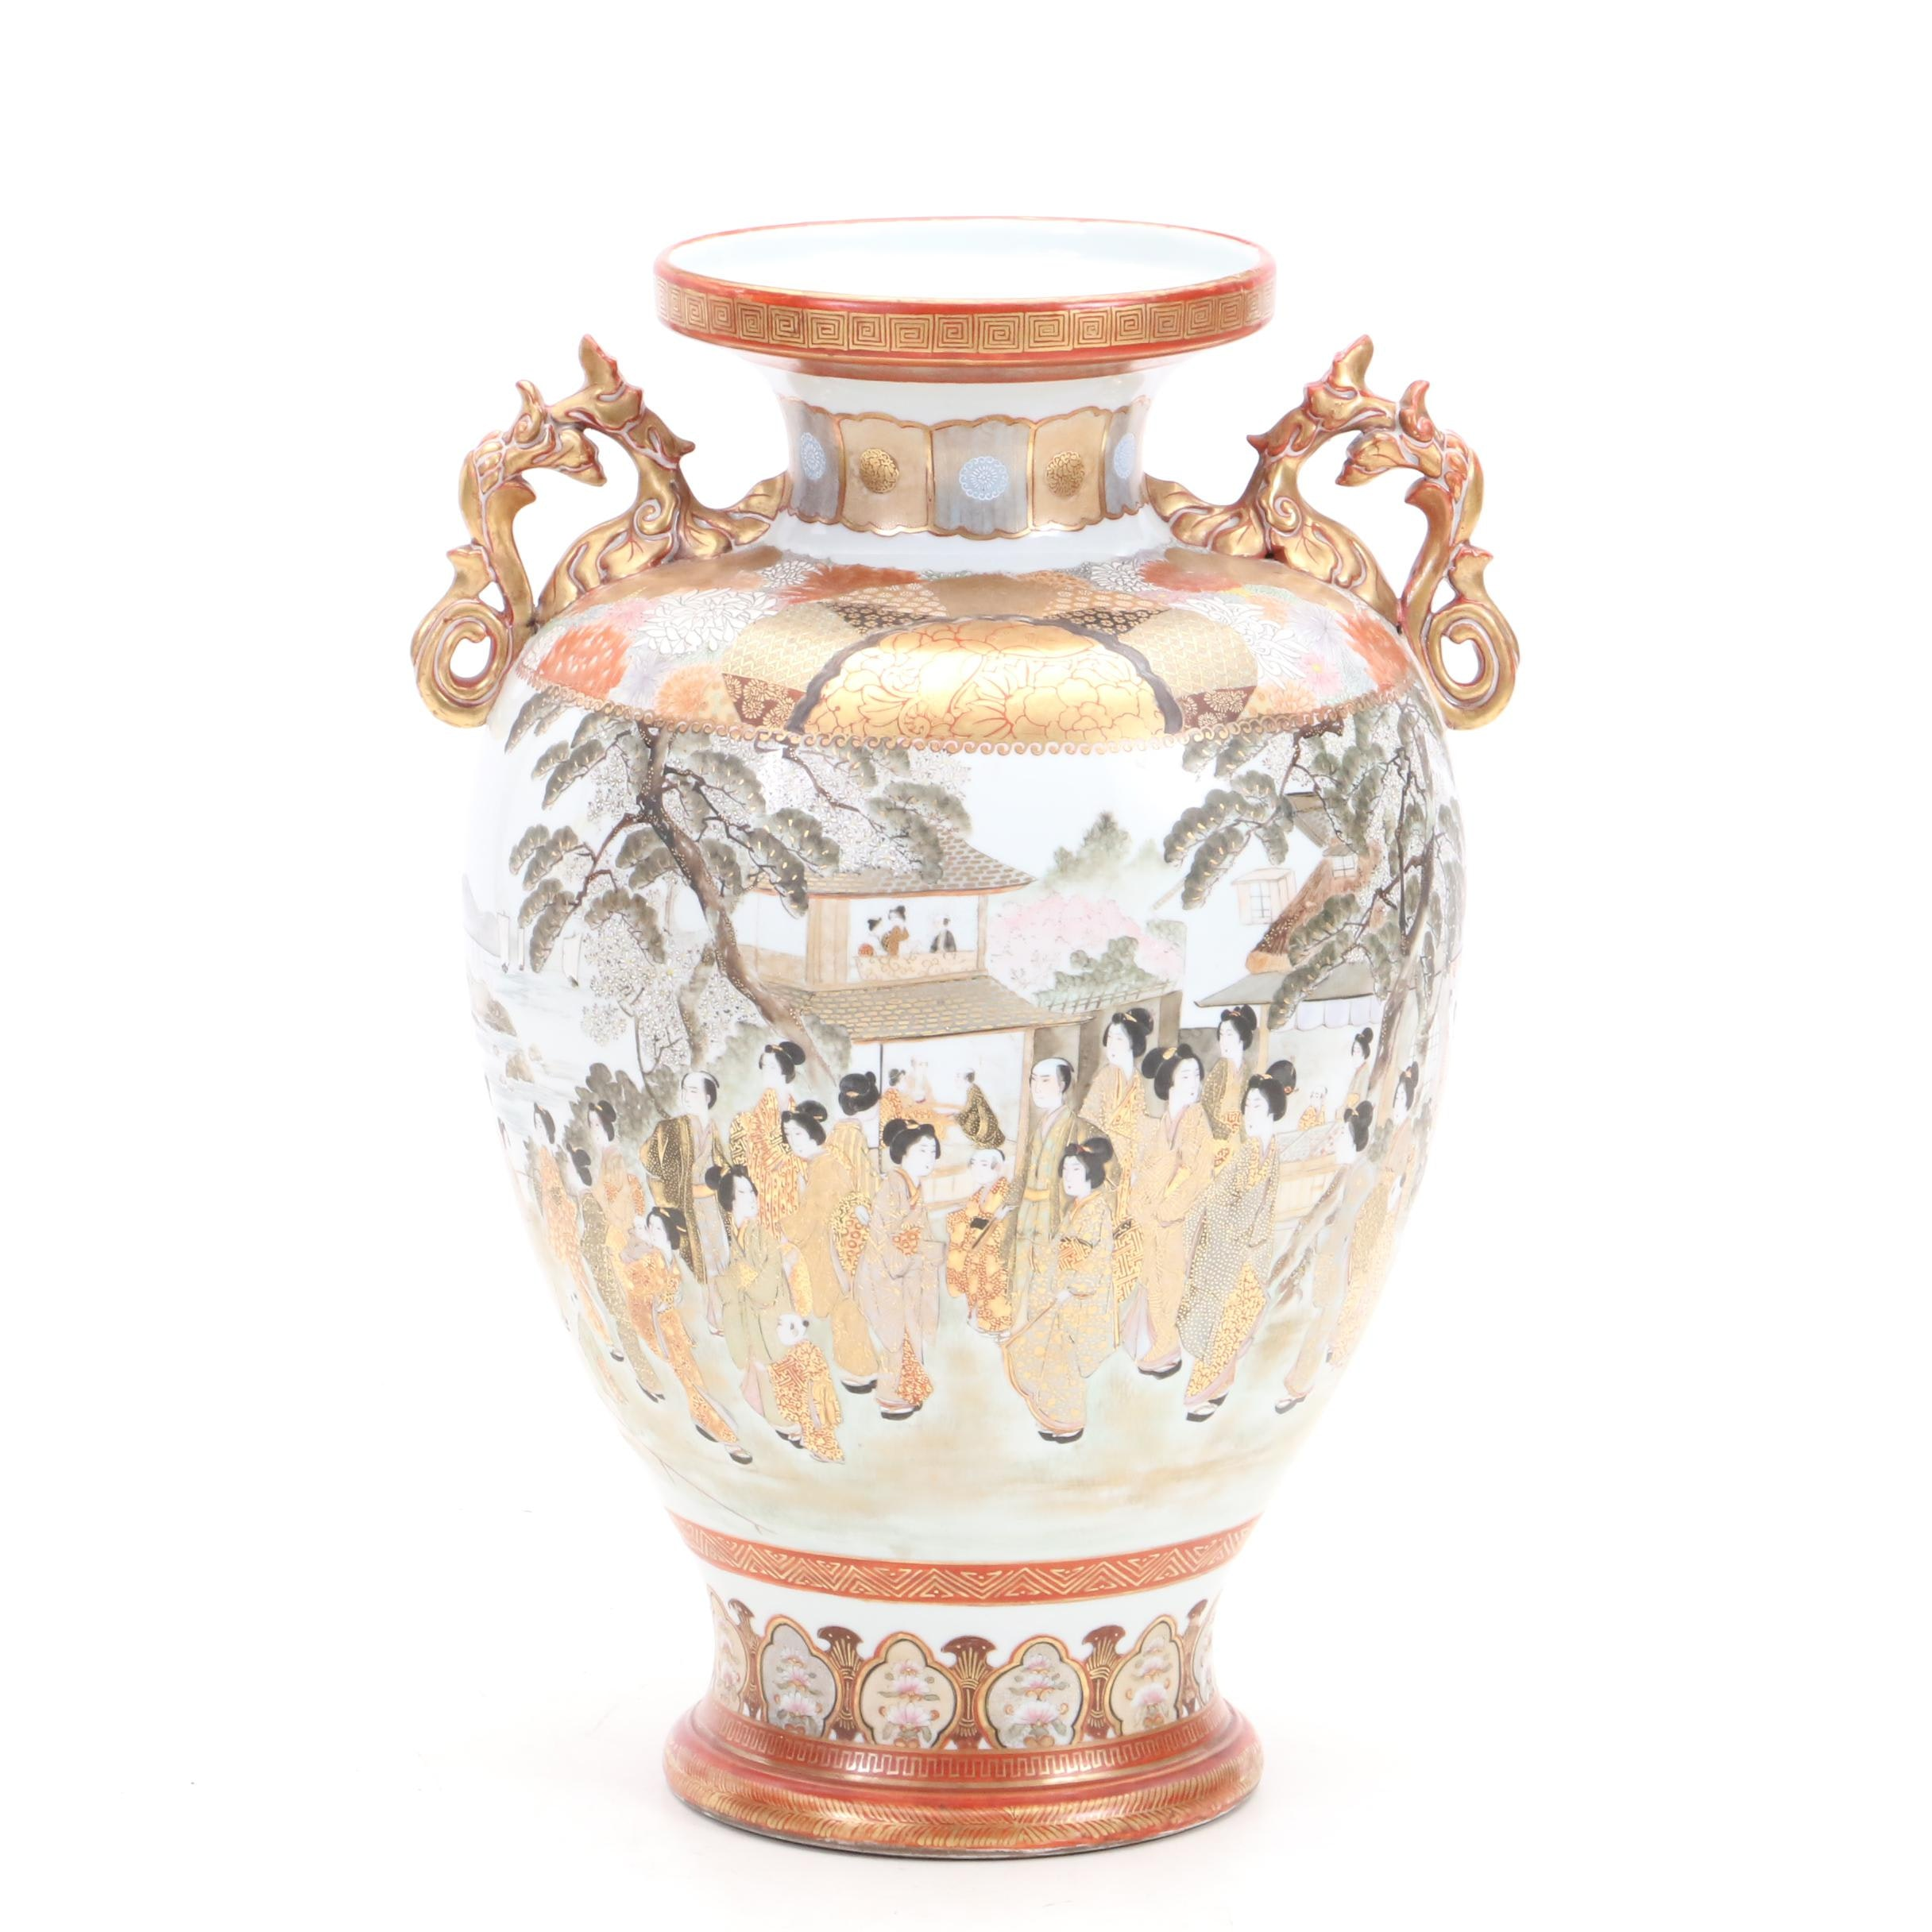 Japanese Meiji Period Kutani Ware Porcelain Vase with Handles